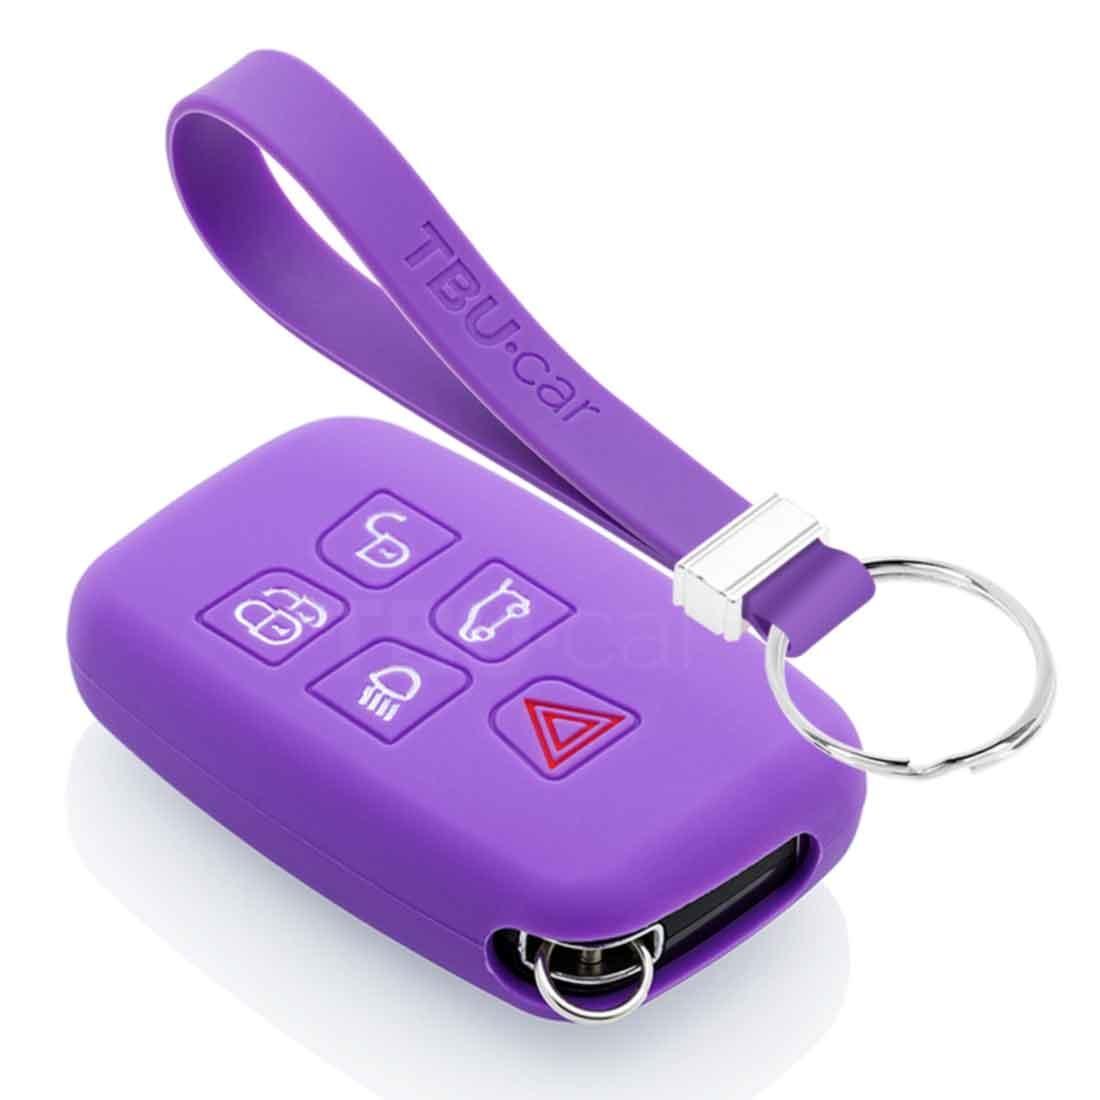 TBU car TBU car Autoschlüssel Hülle kompatibel mit Land Rover 5 Tasten (Keyless Entry) - Schutzhülle aus Silikon - Auto Schlüsselhülle Cover in Violett